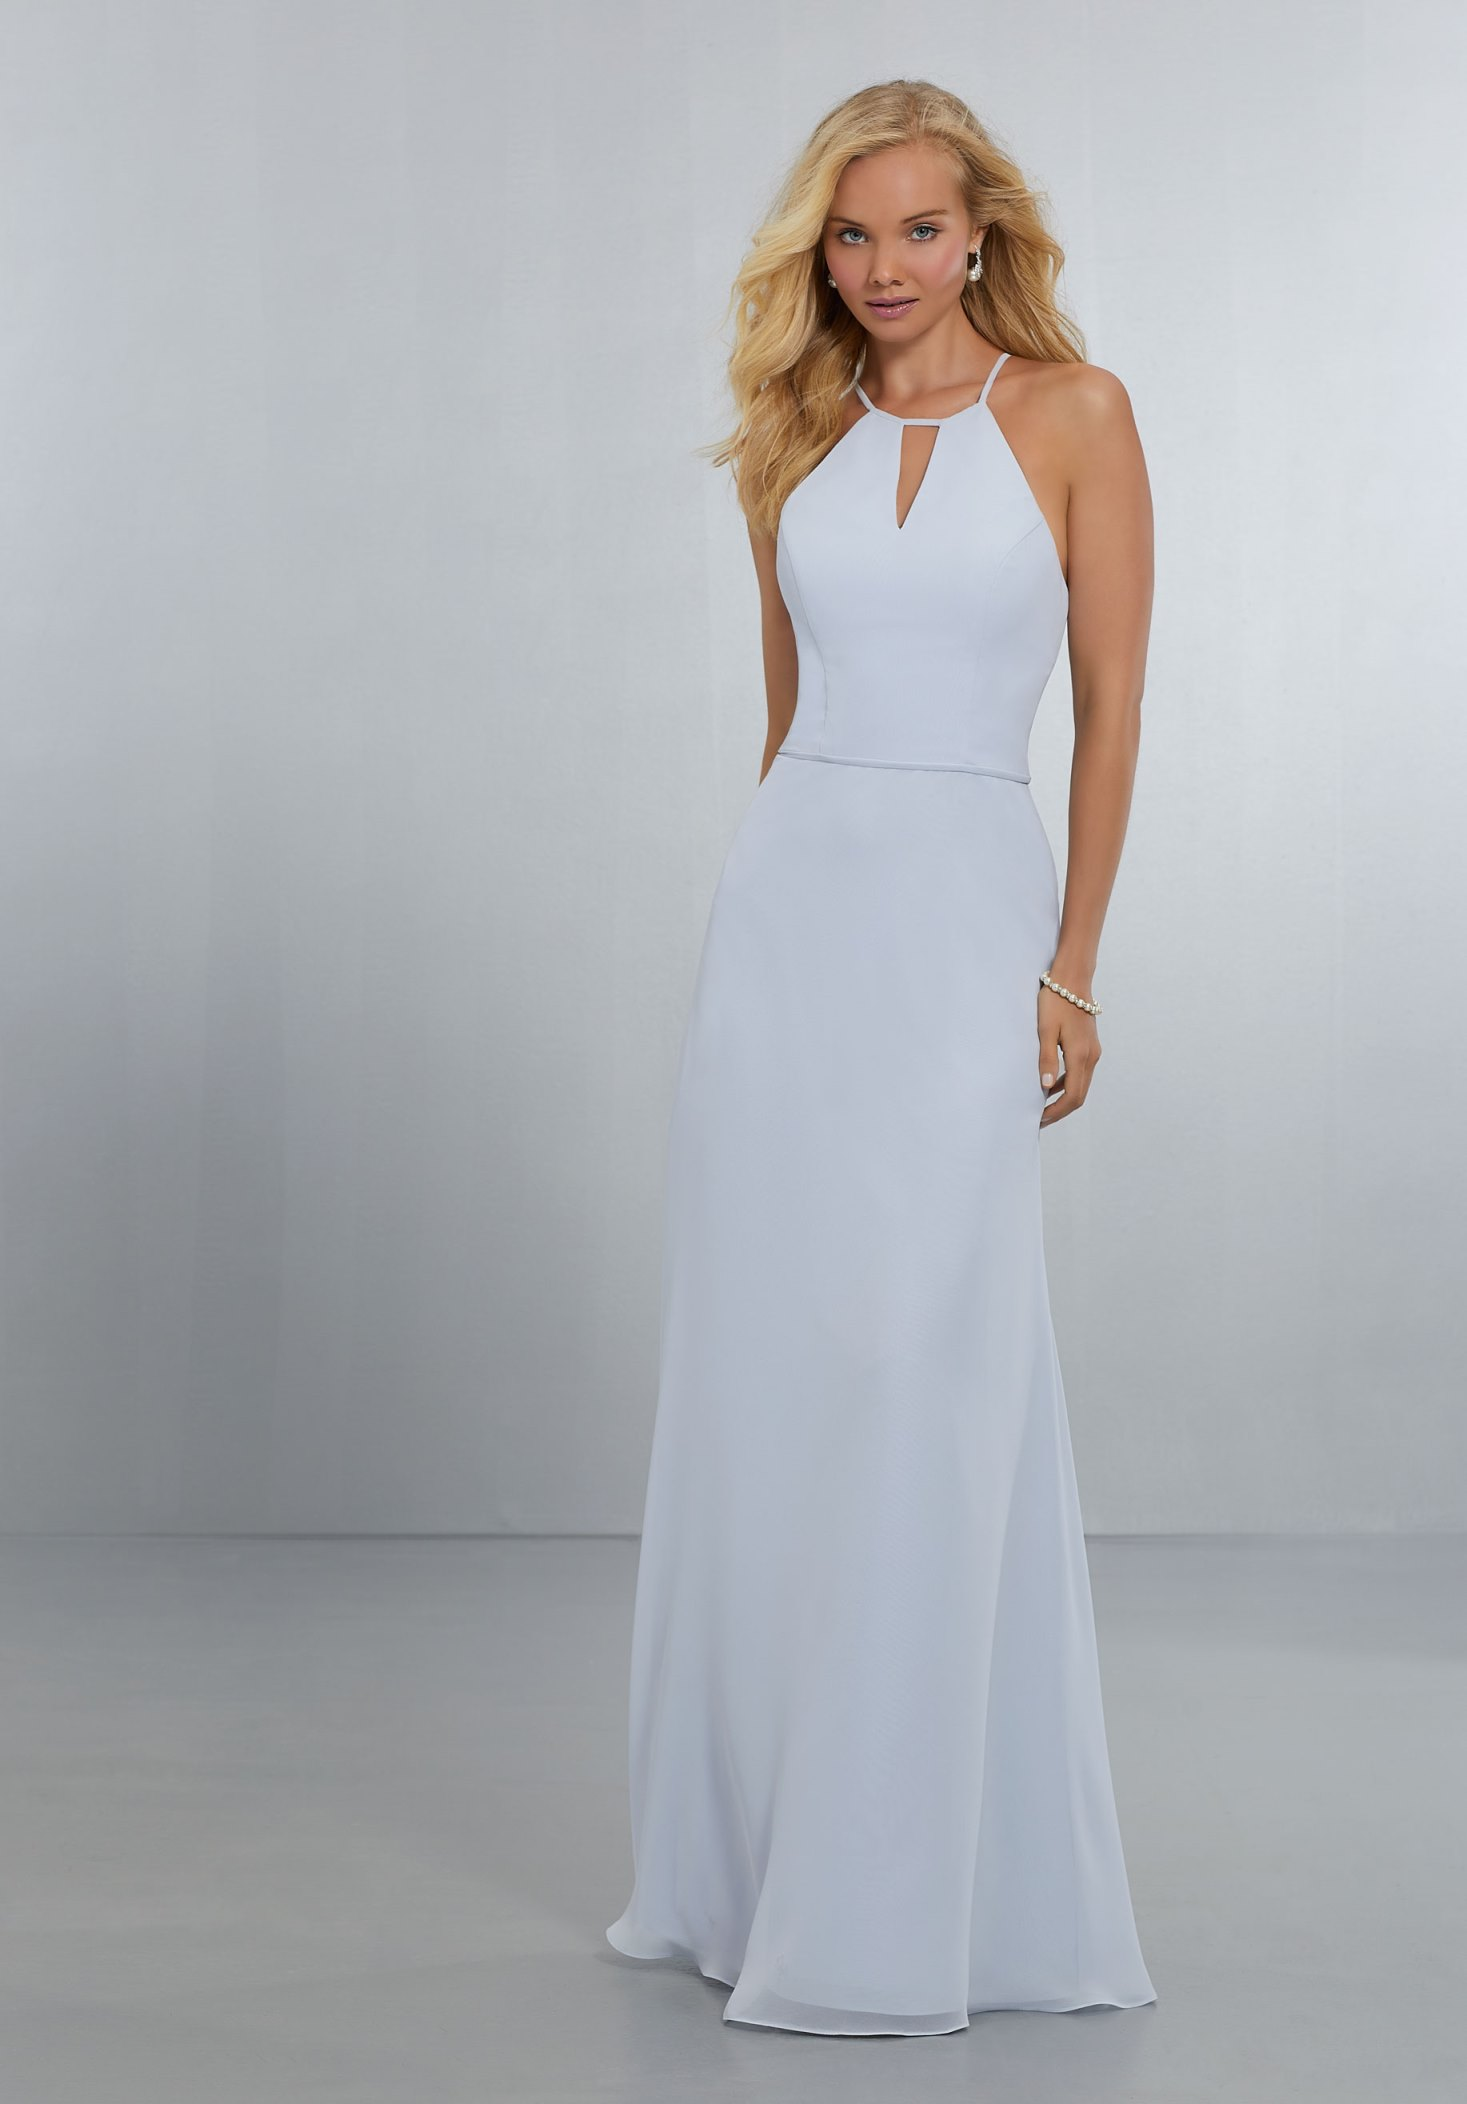 Dress - Mori Lee BRIDESMAIDS SPRING 2018 Collection: 21563 - Chiffon ...